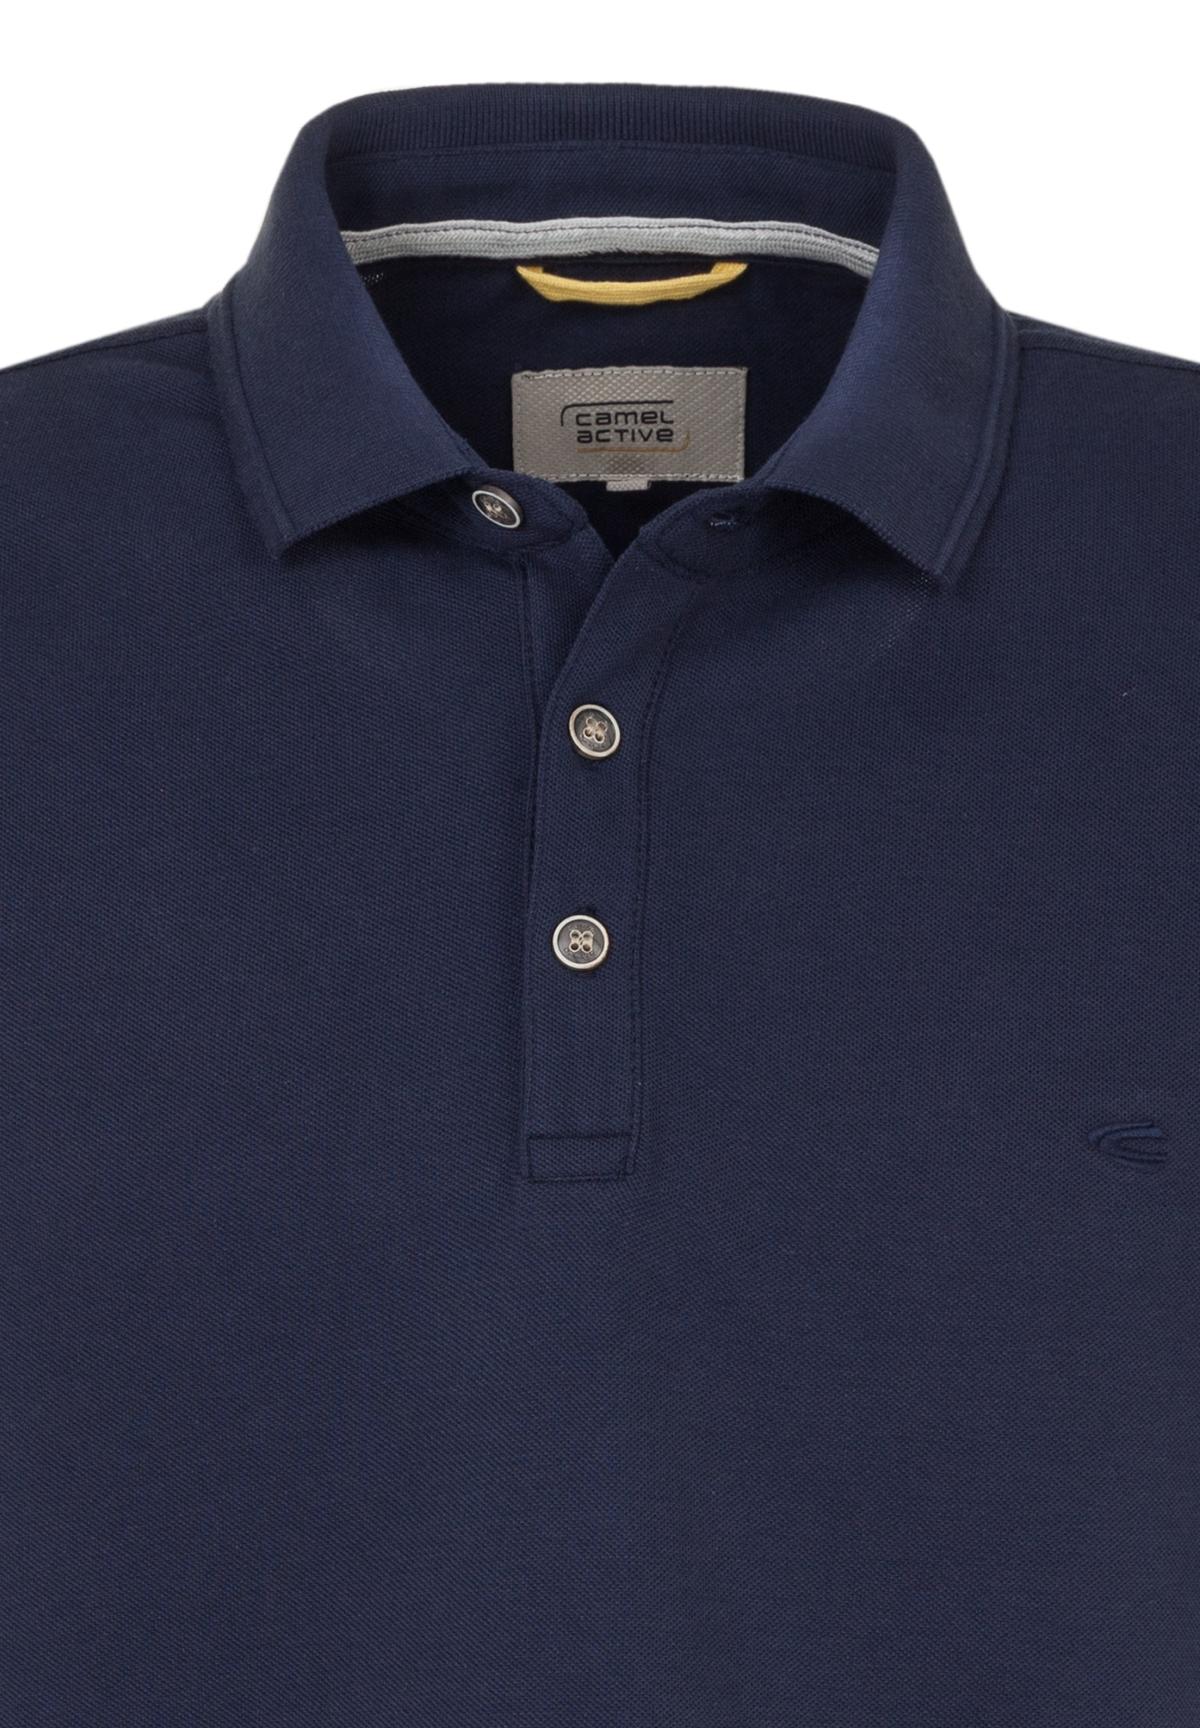 Camel-Active-Herren-Shirt-Poloshirt-Pique-Regular-Fit-NEU Indexbild 25